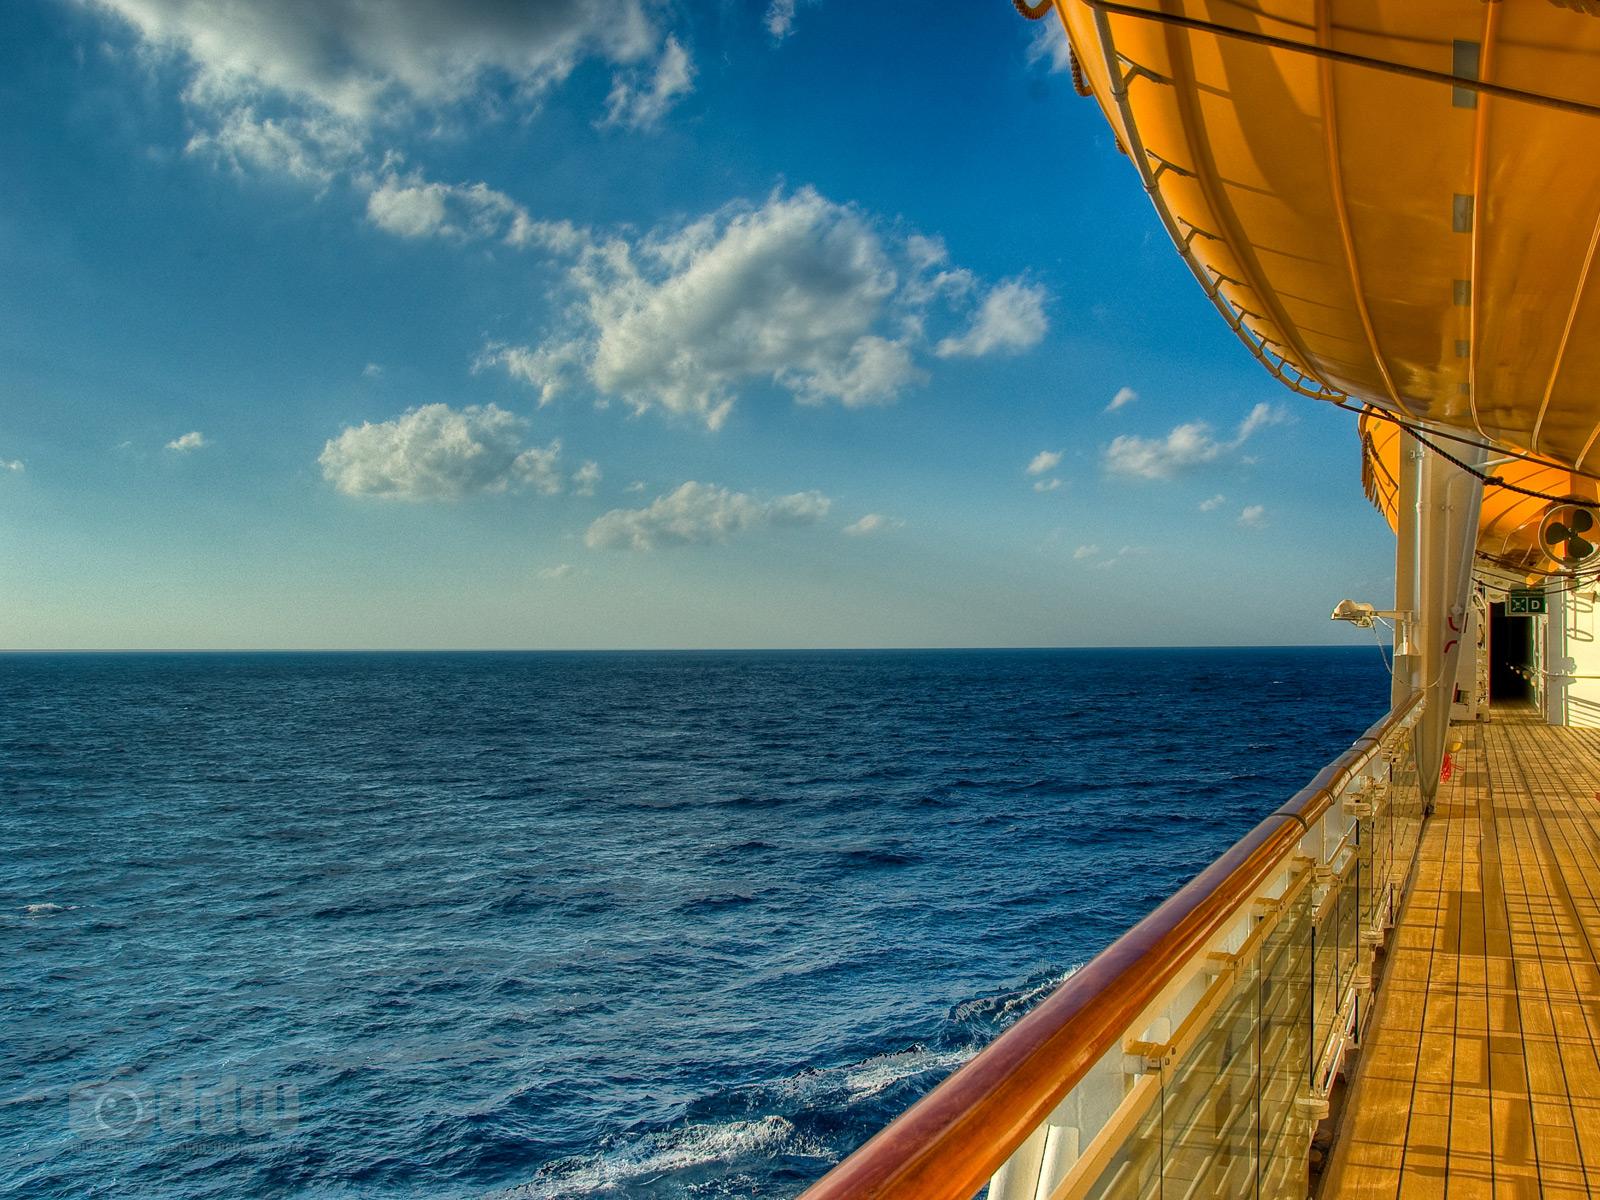 Disney Cruise Deck Desktop Wallpaper 1600 x 1200 1600x1200